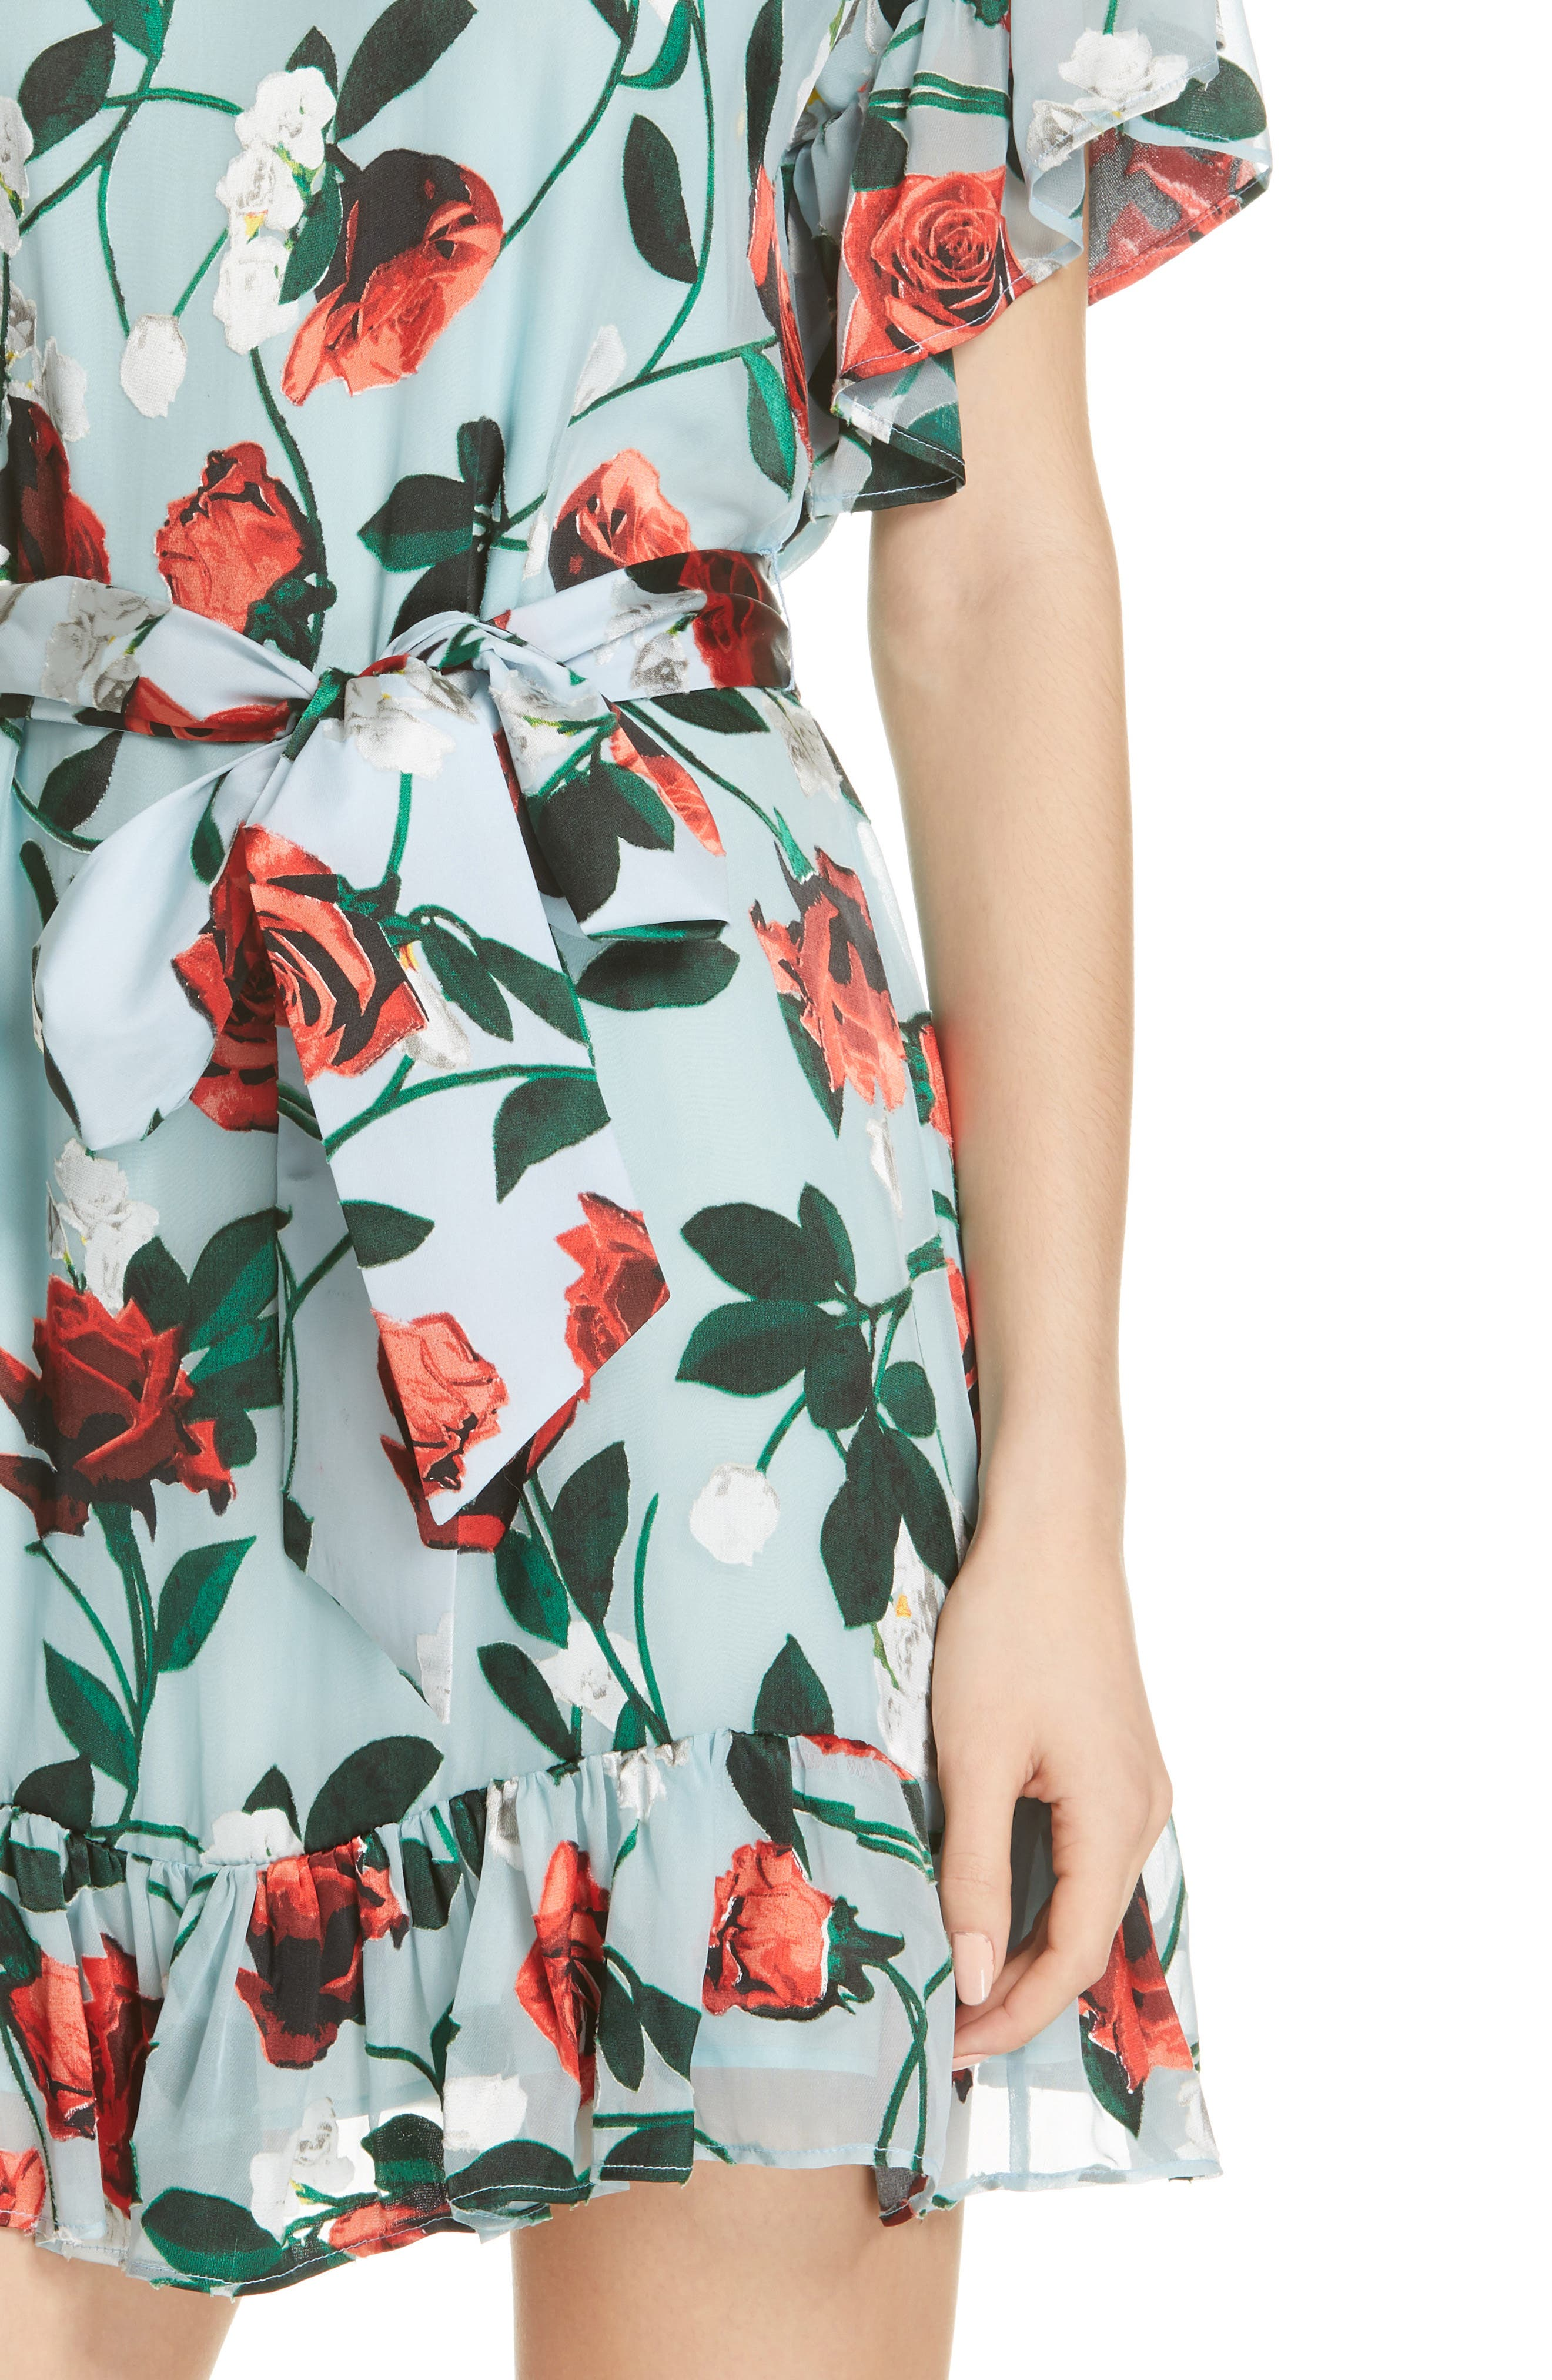 Ellamae Ruffle Sleeve Dress,                             Alternate thumbnail 4, color,                             ROSEBUD FLORAL POWDER BLUE